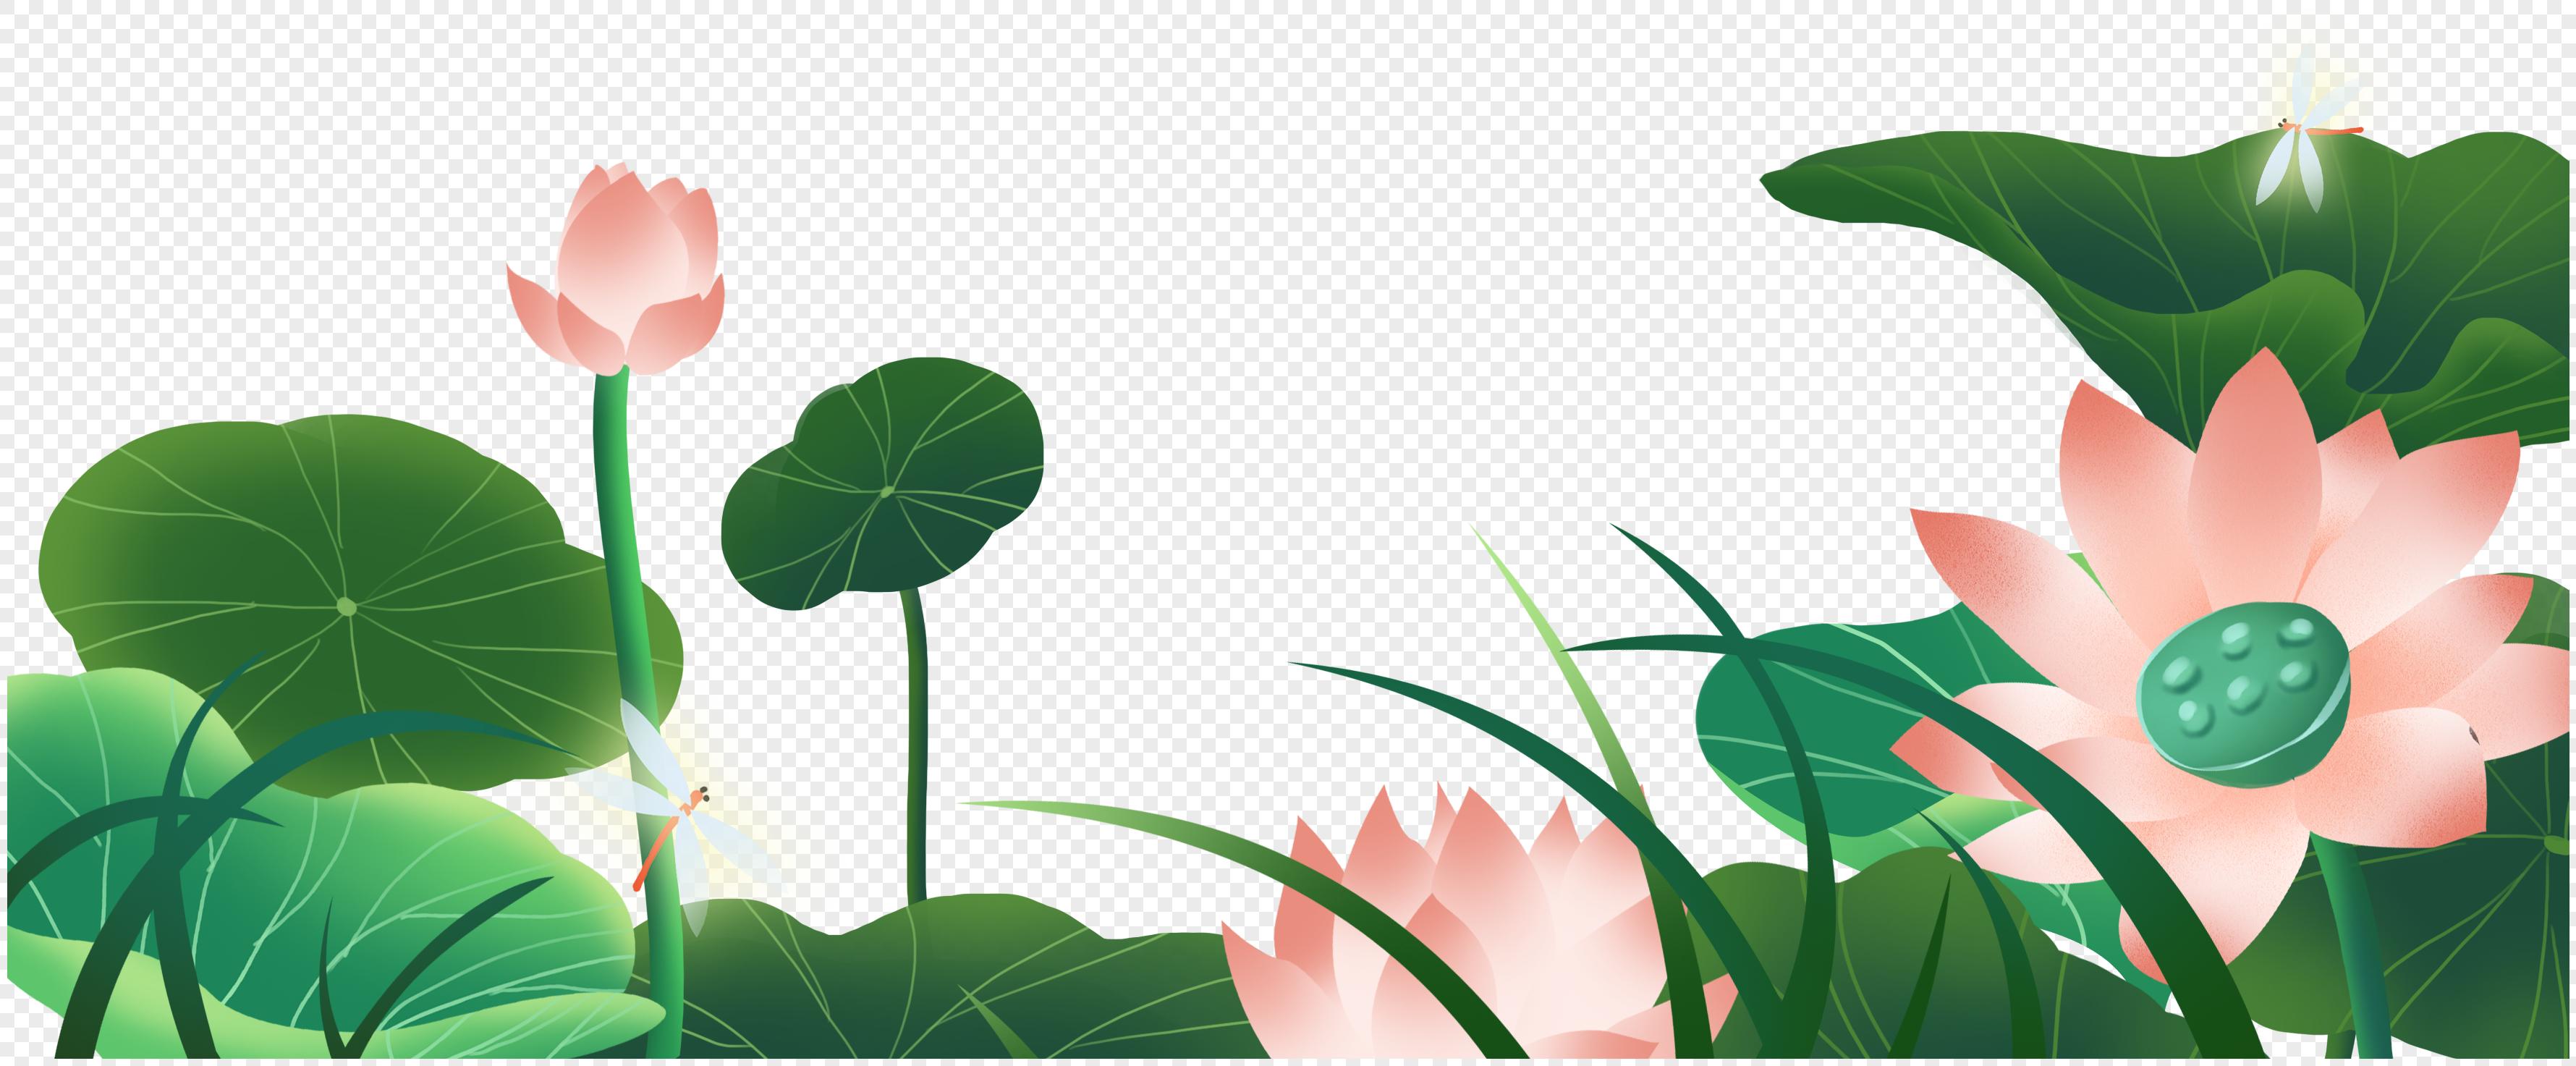 Lotus flower png imagepicture free download 400290464lovepik lotus flower mightylinksfo